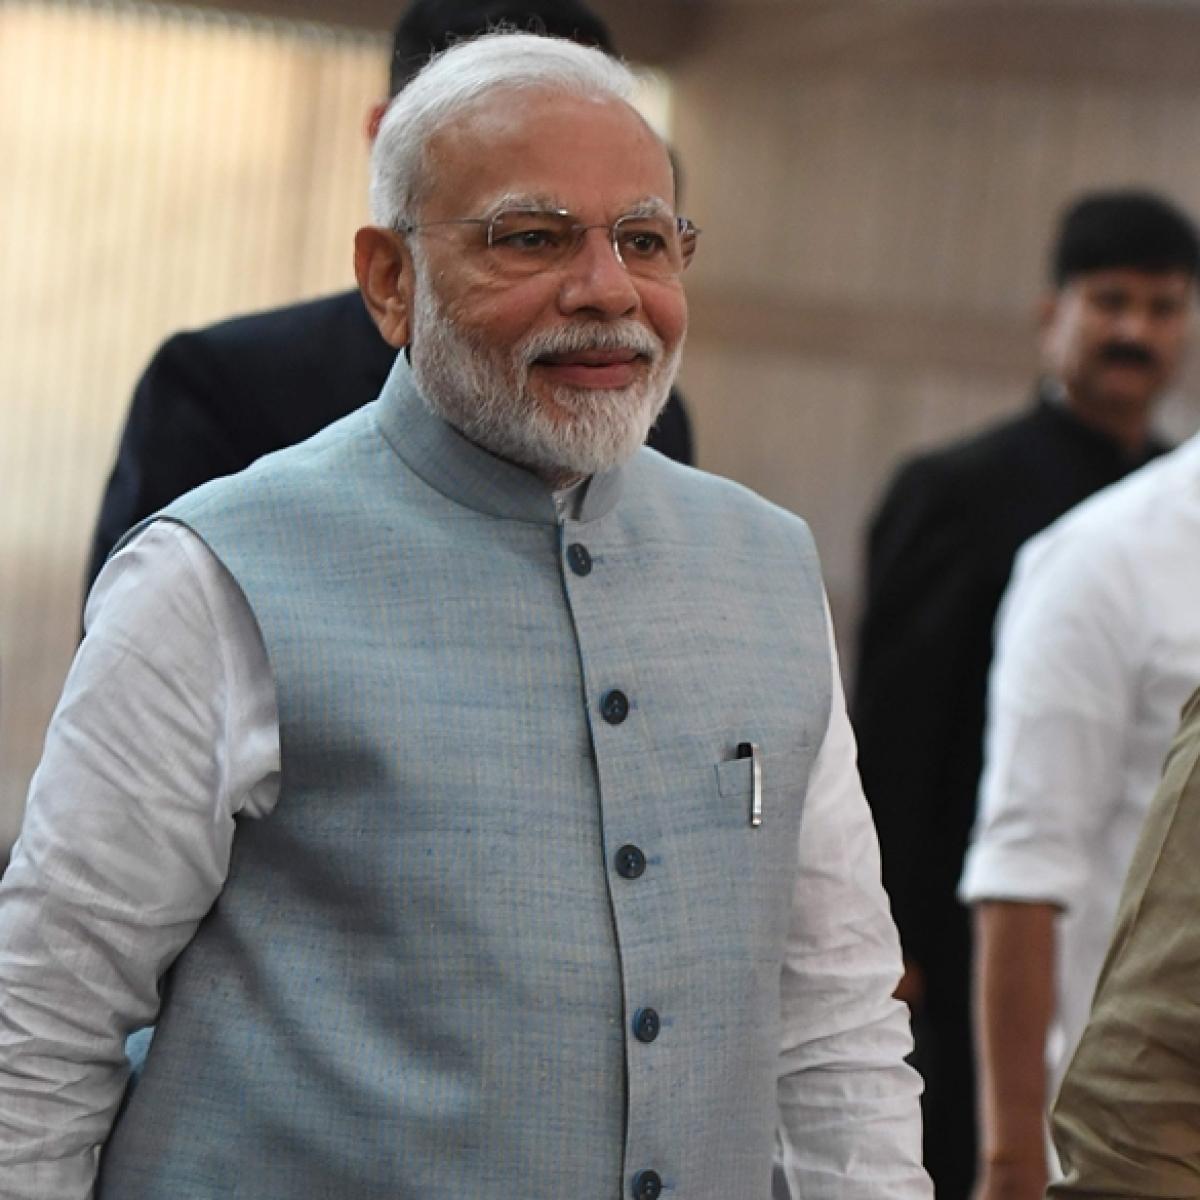 PM Modi pep talk to MPs; has a dig at Manmohan Singh